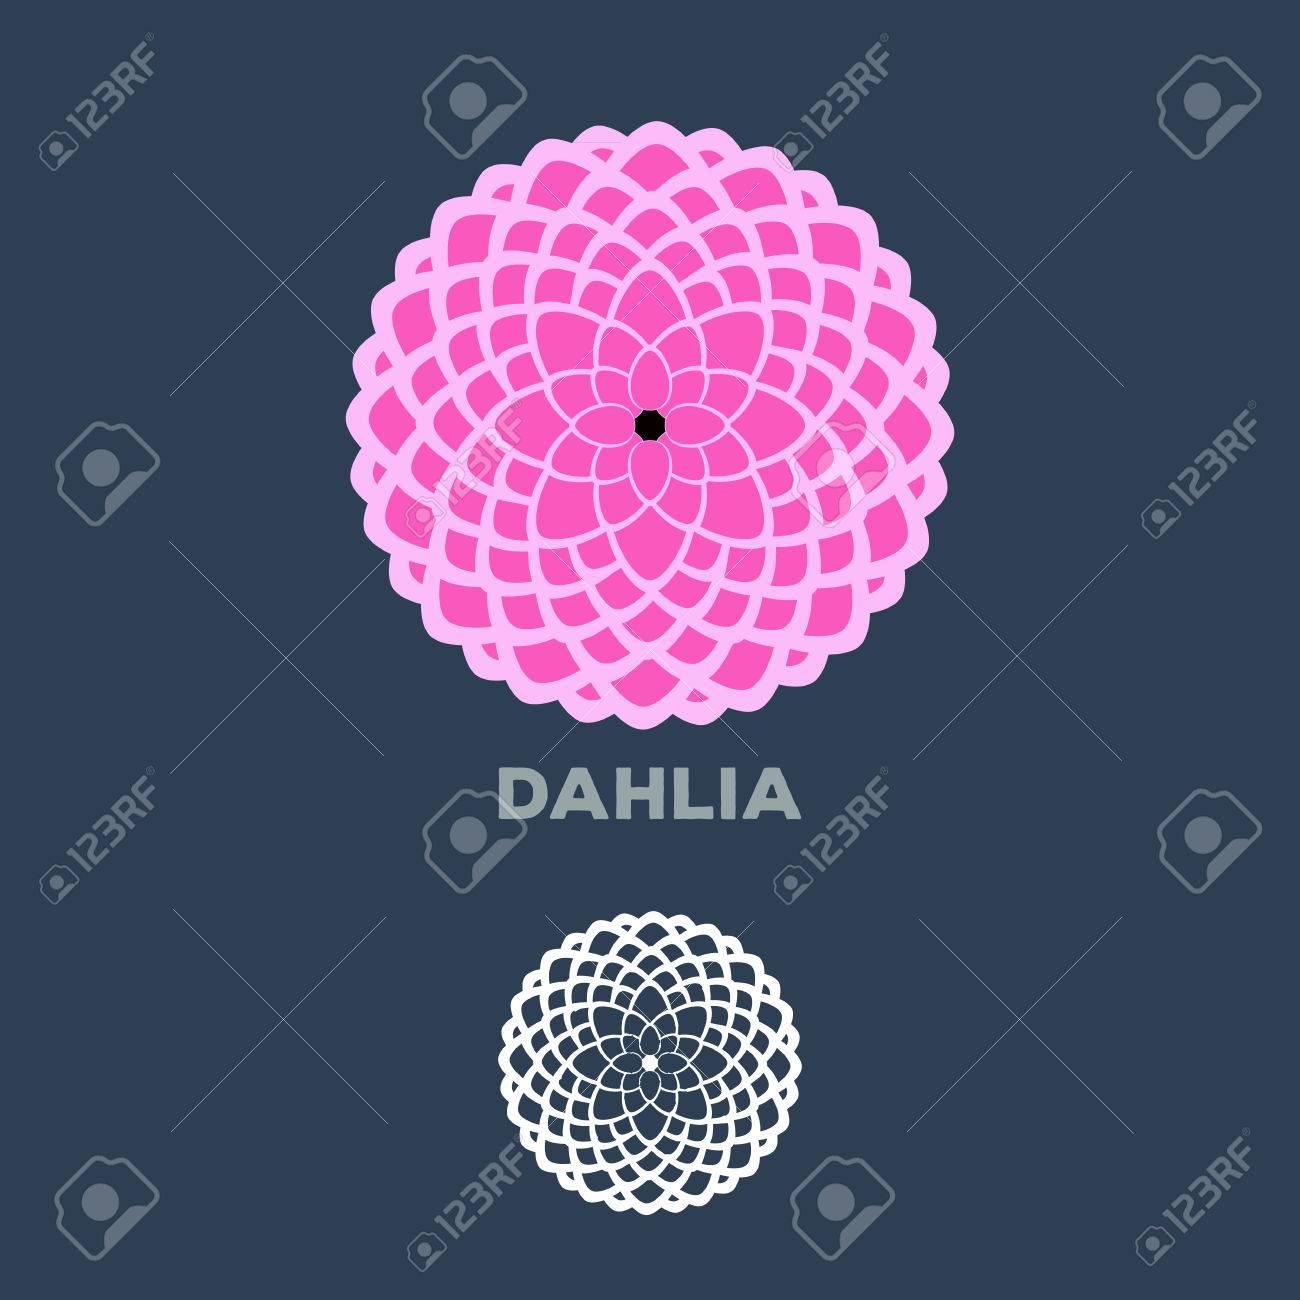 Dahlia flower logo vector - 40701561